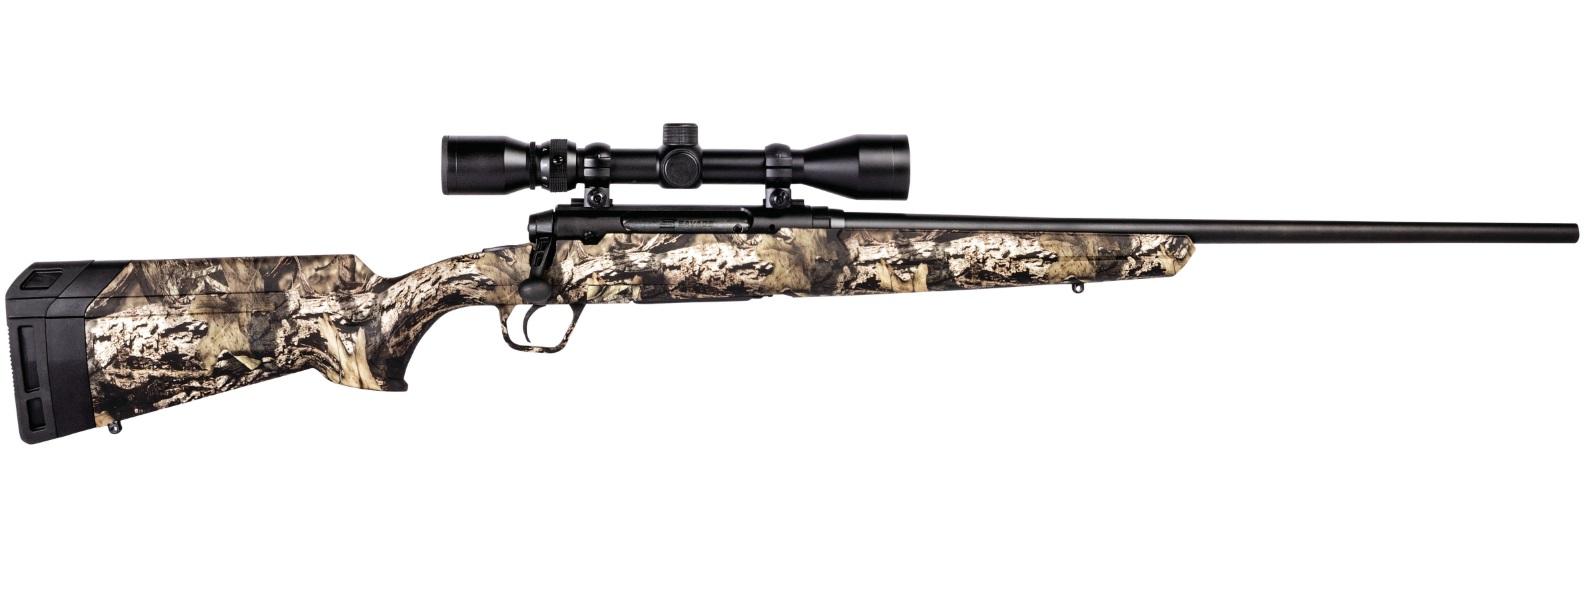 Savage Arms Axis XP Camo 7mm-08